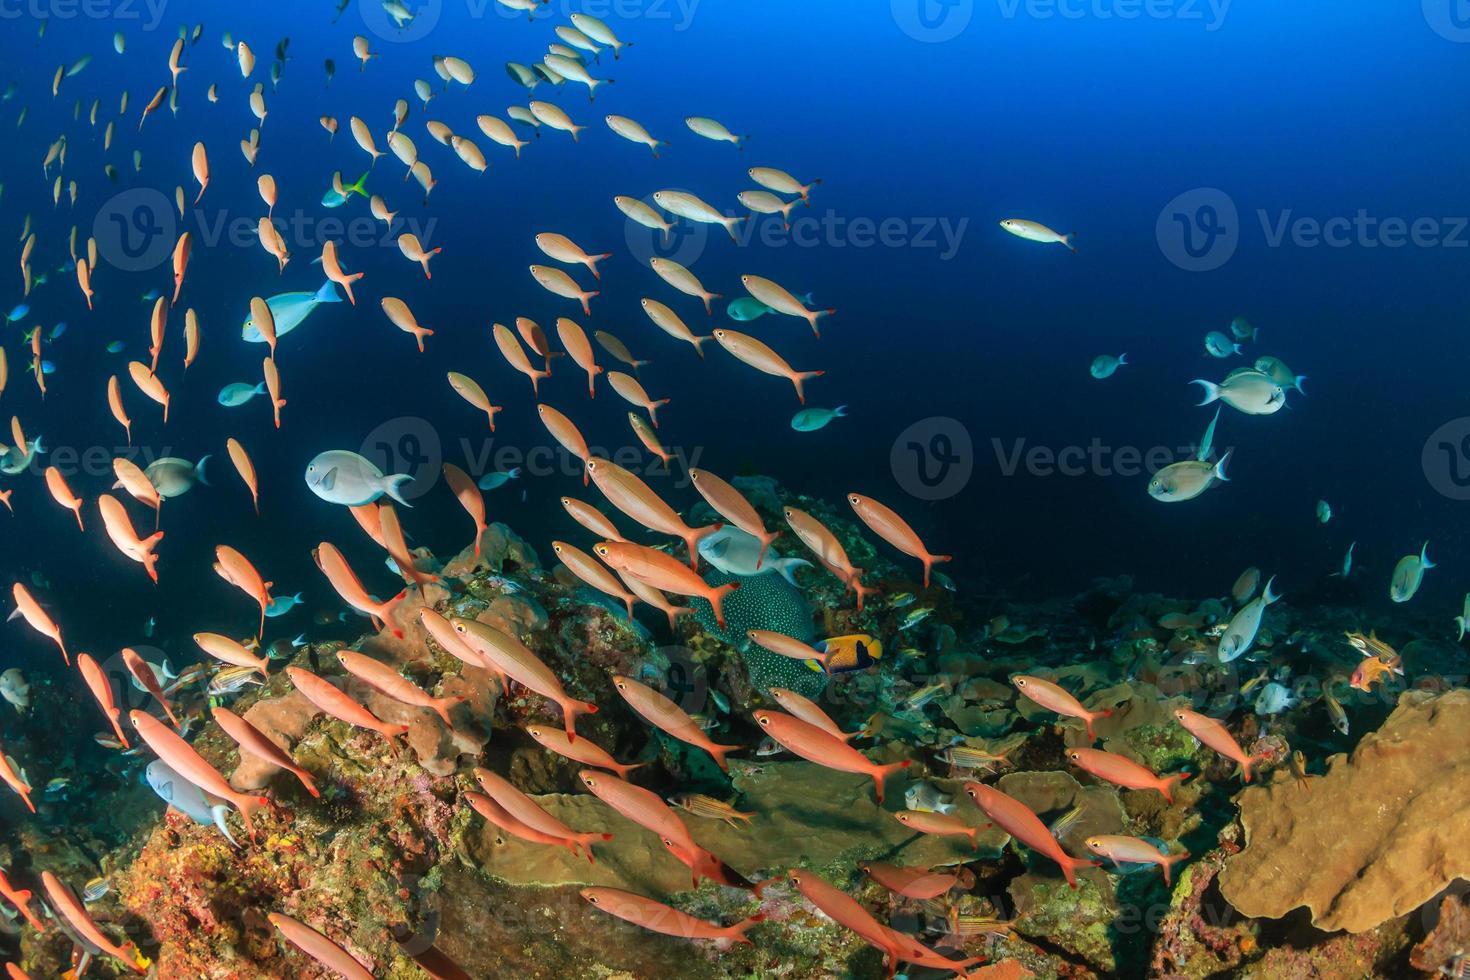 stimar av tropisk fisk runt ett djupt vatten korall topp foto